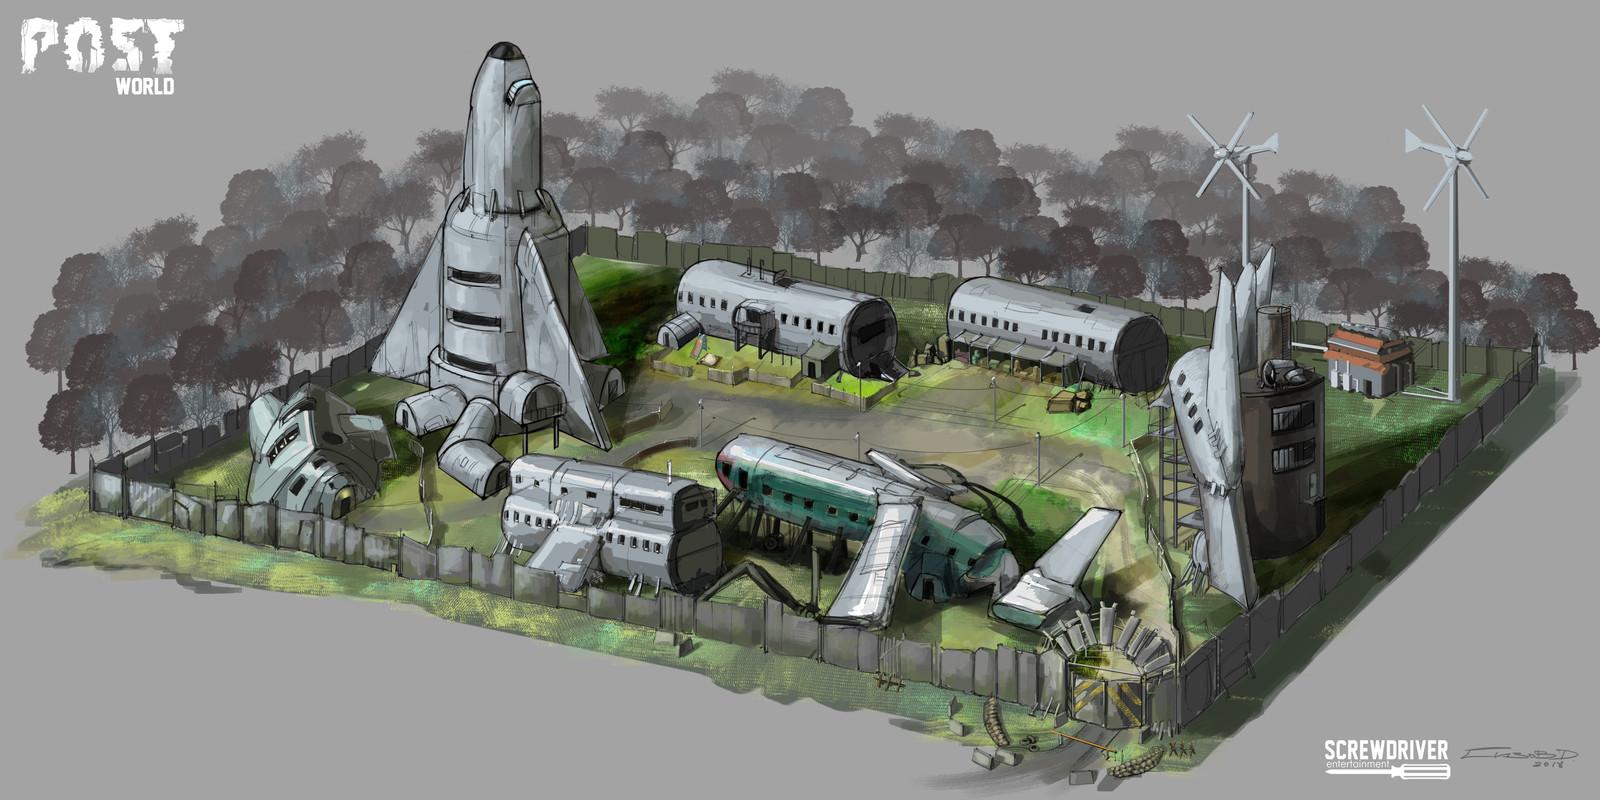 Location - airplane graveyard